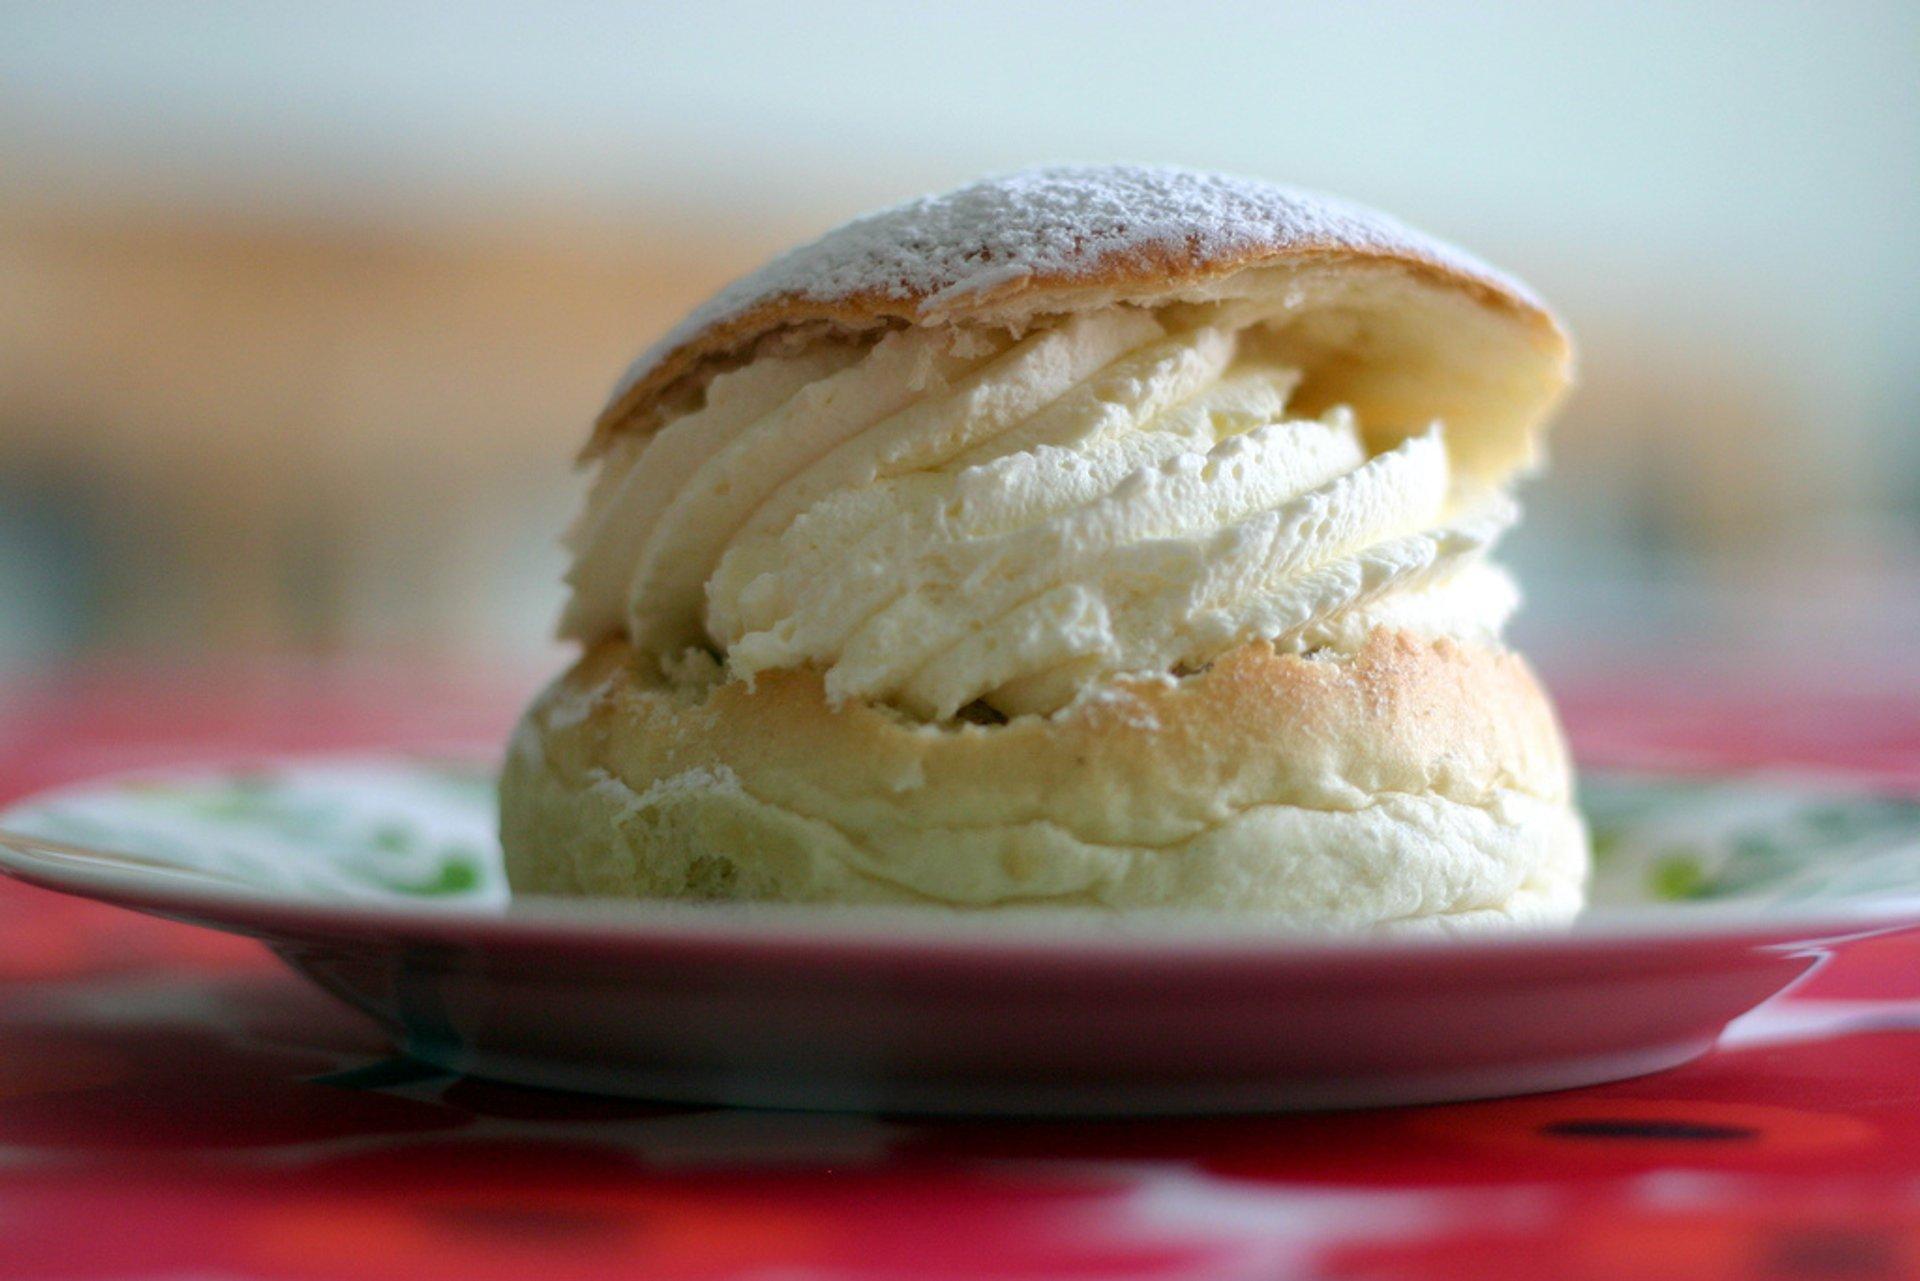 Semla Dessert in Sweden - Best Season 2020